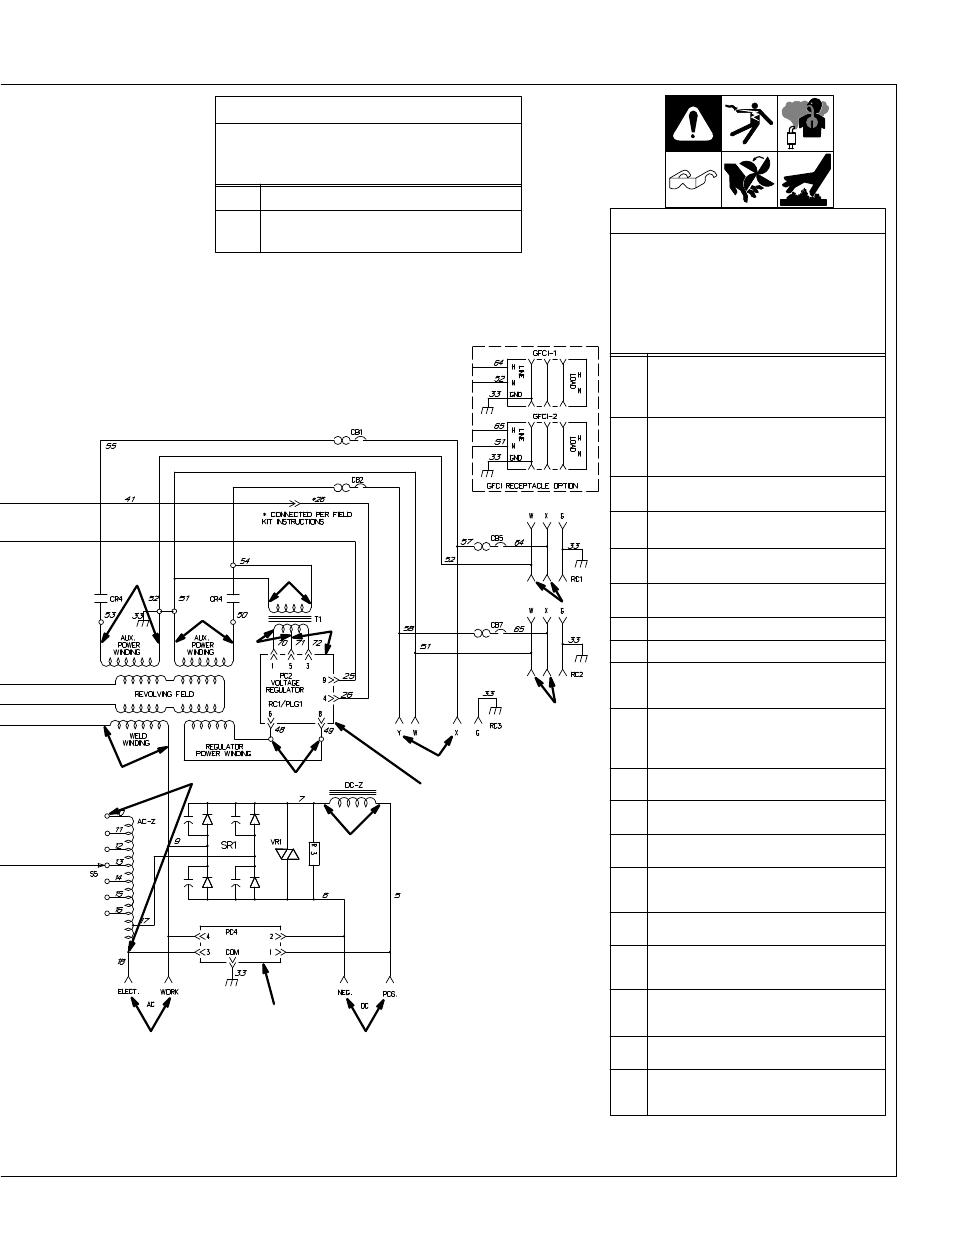 hight resolution of miller 200 welder wiring diagram for a wiring diagram 220v welder wiring diagram miller thunderbolt welder